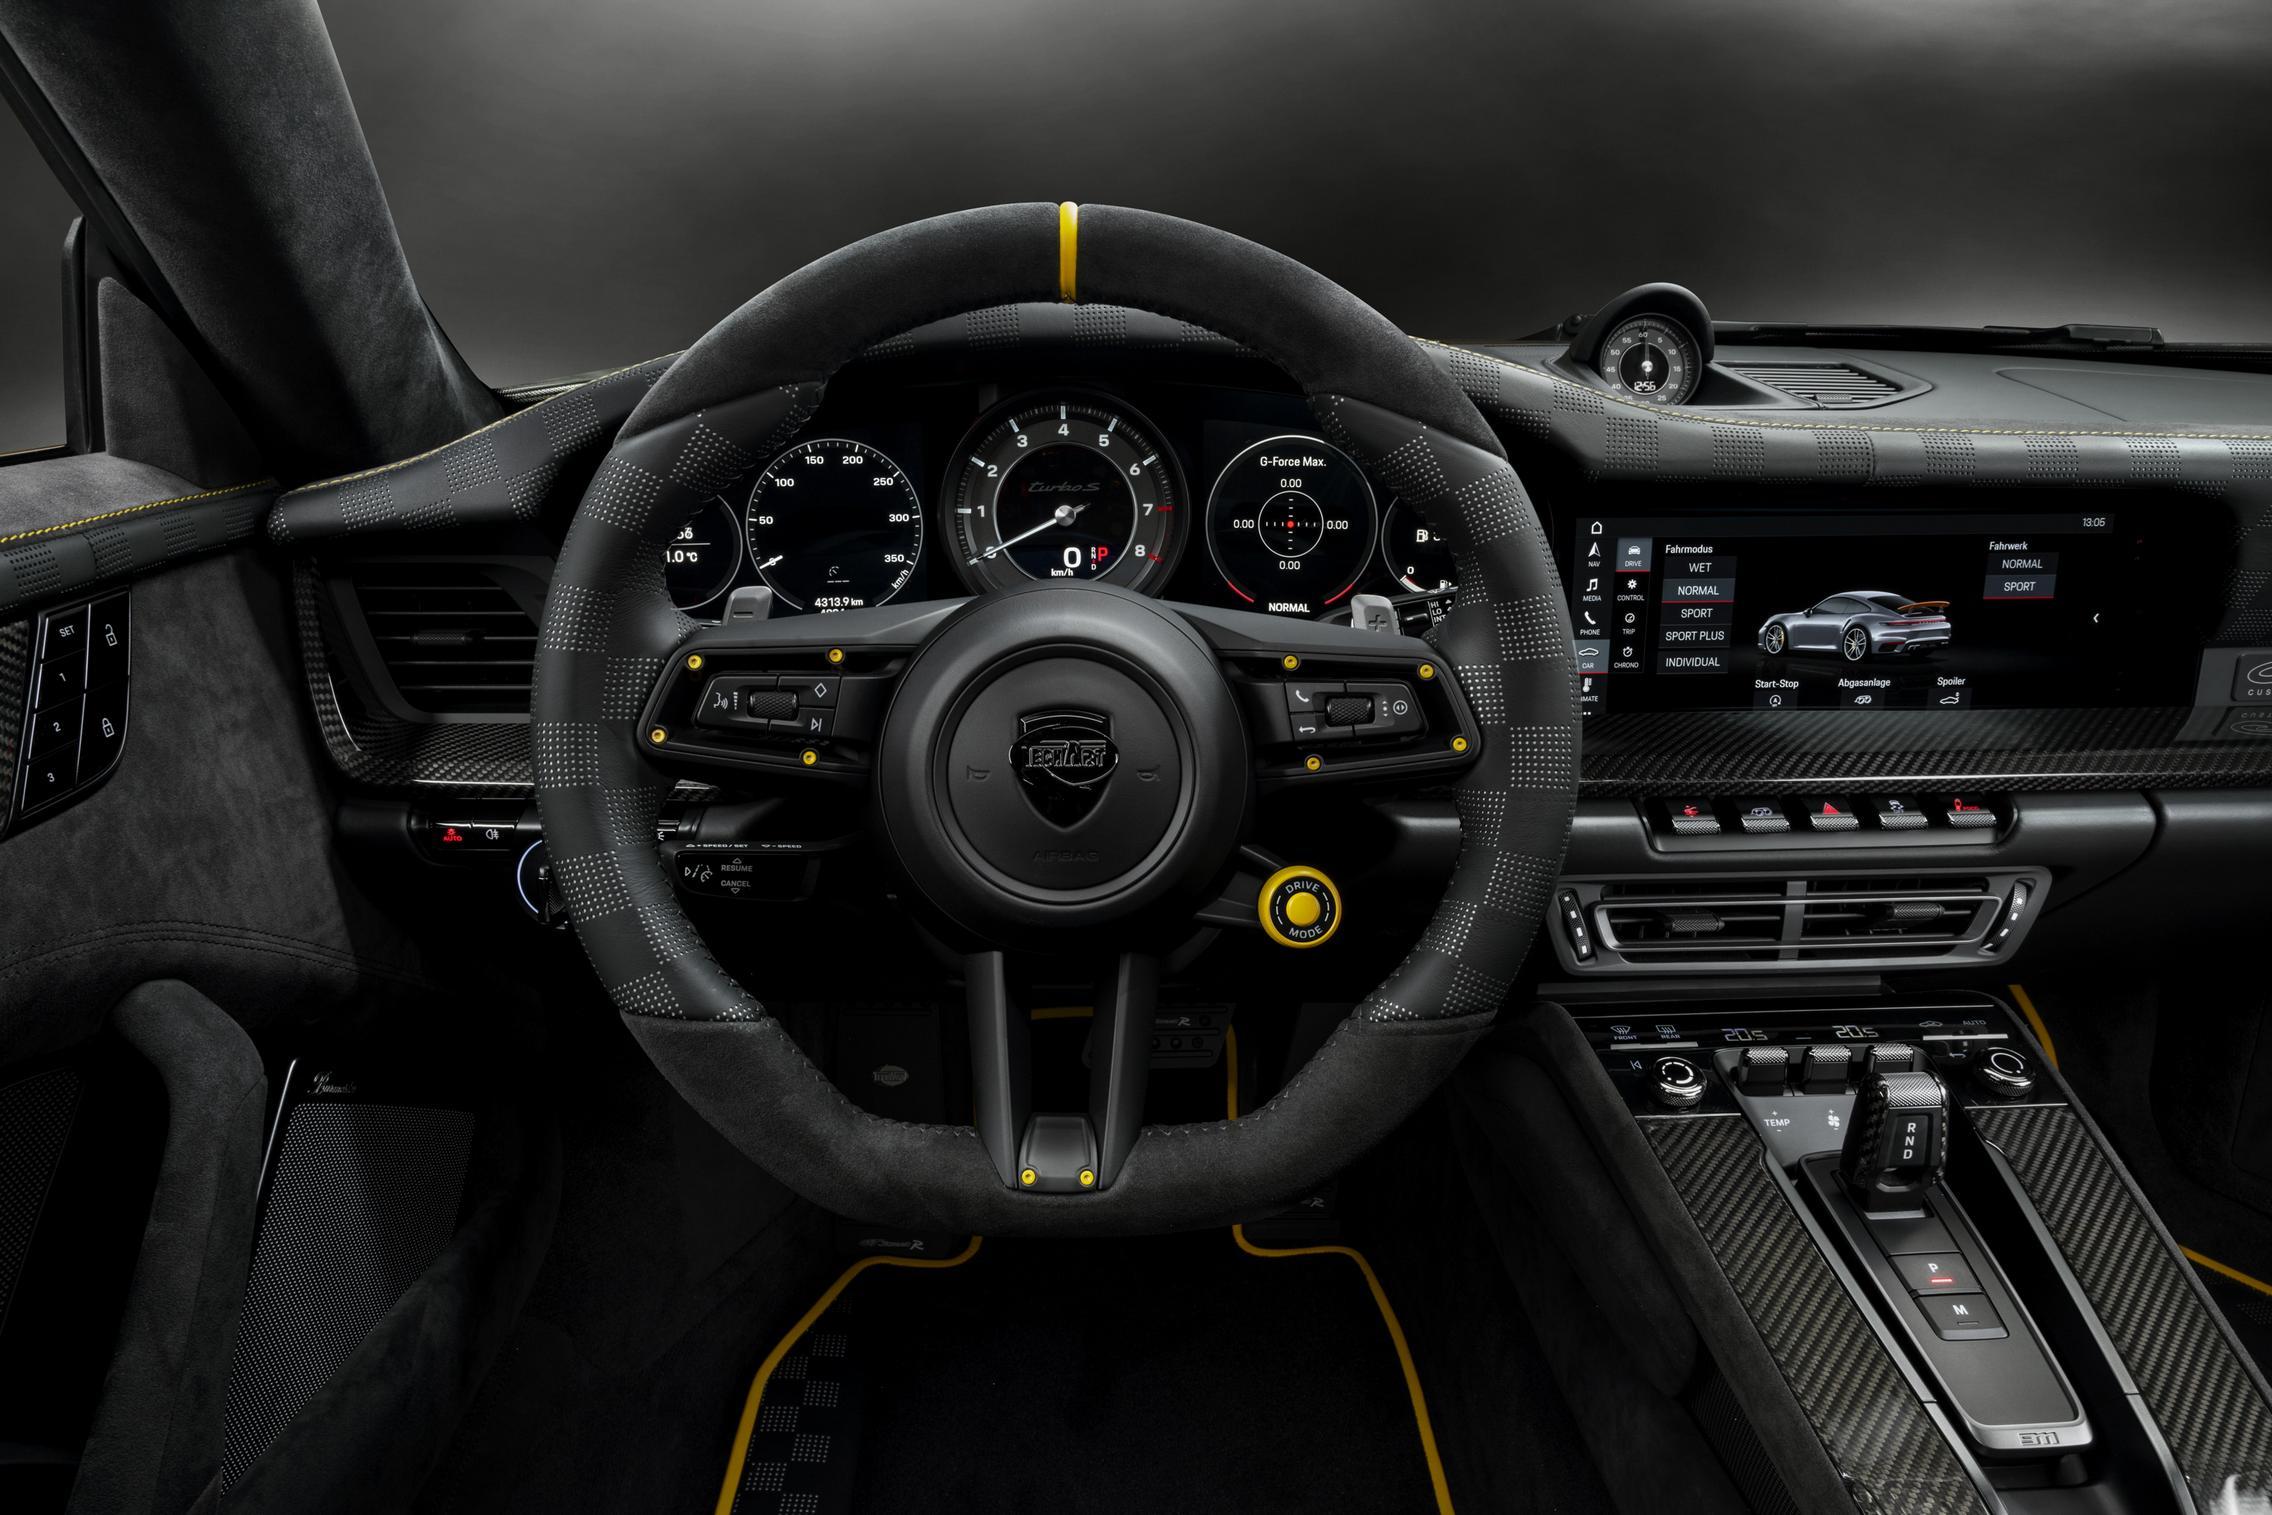 Techart GTstreet R steering wheel